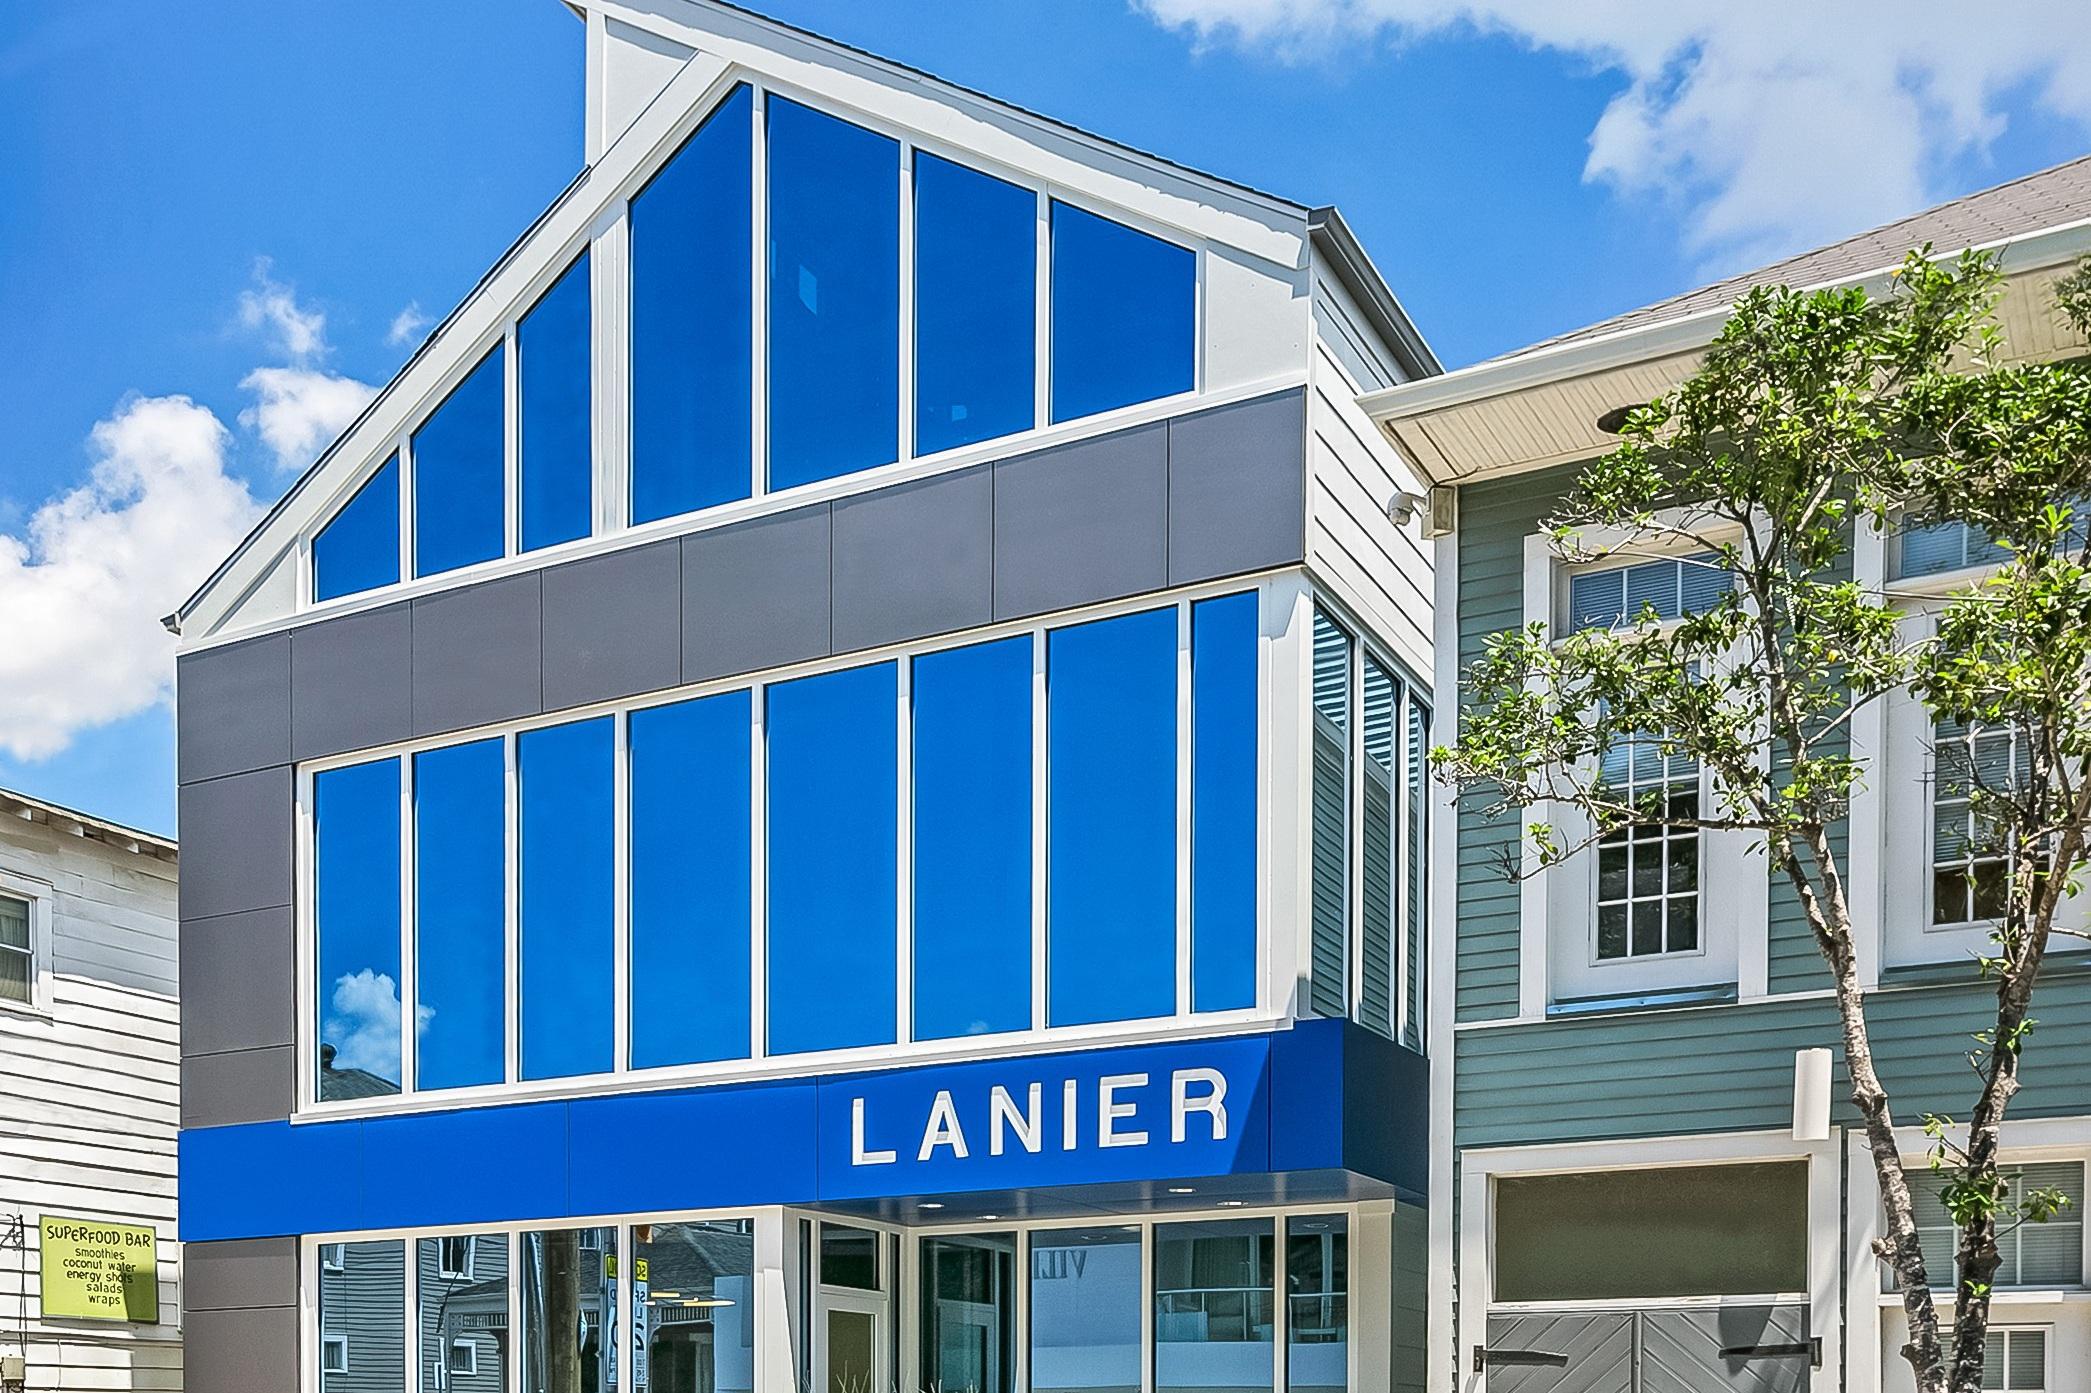 LANIER & associates